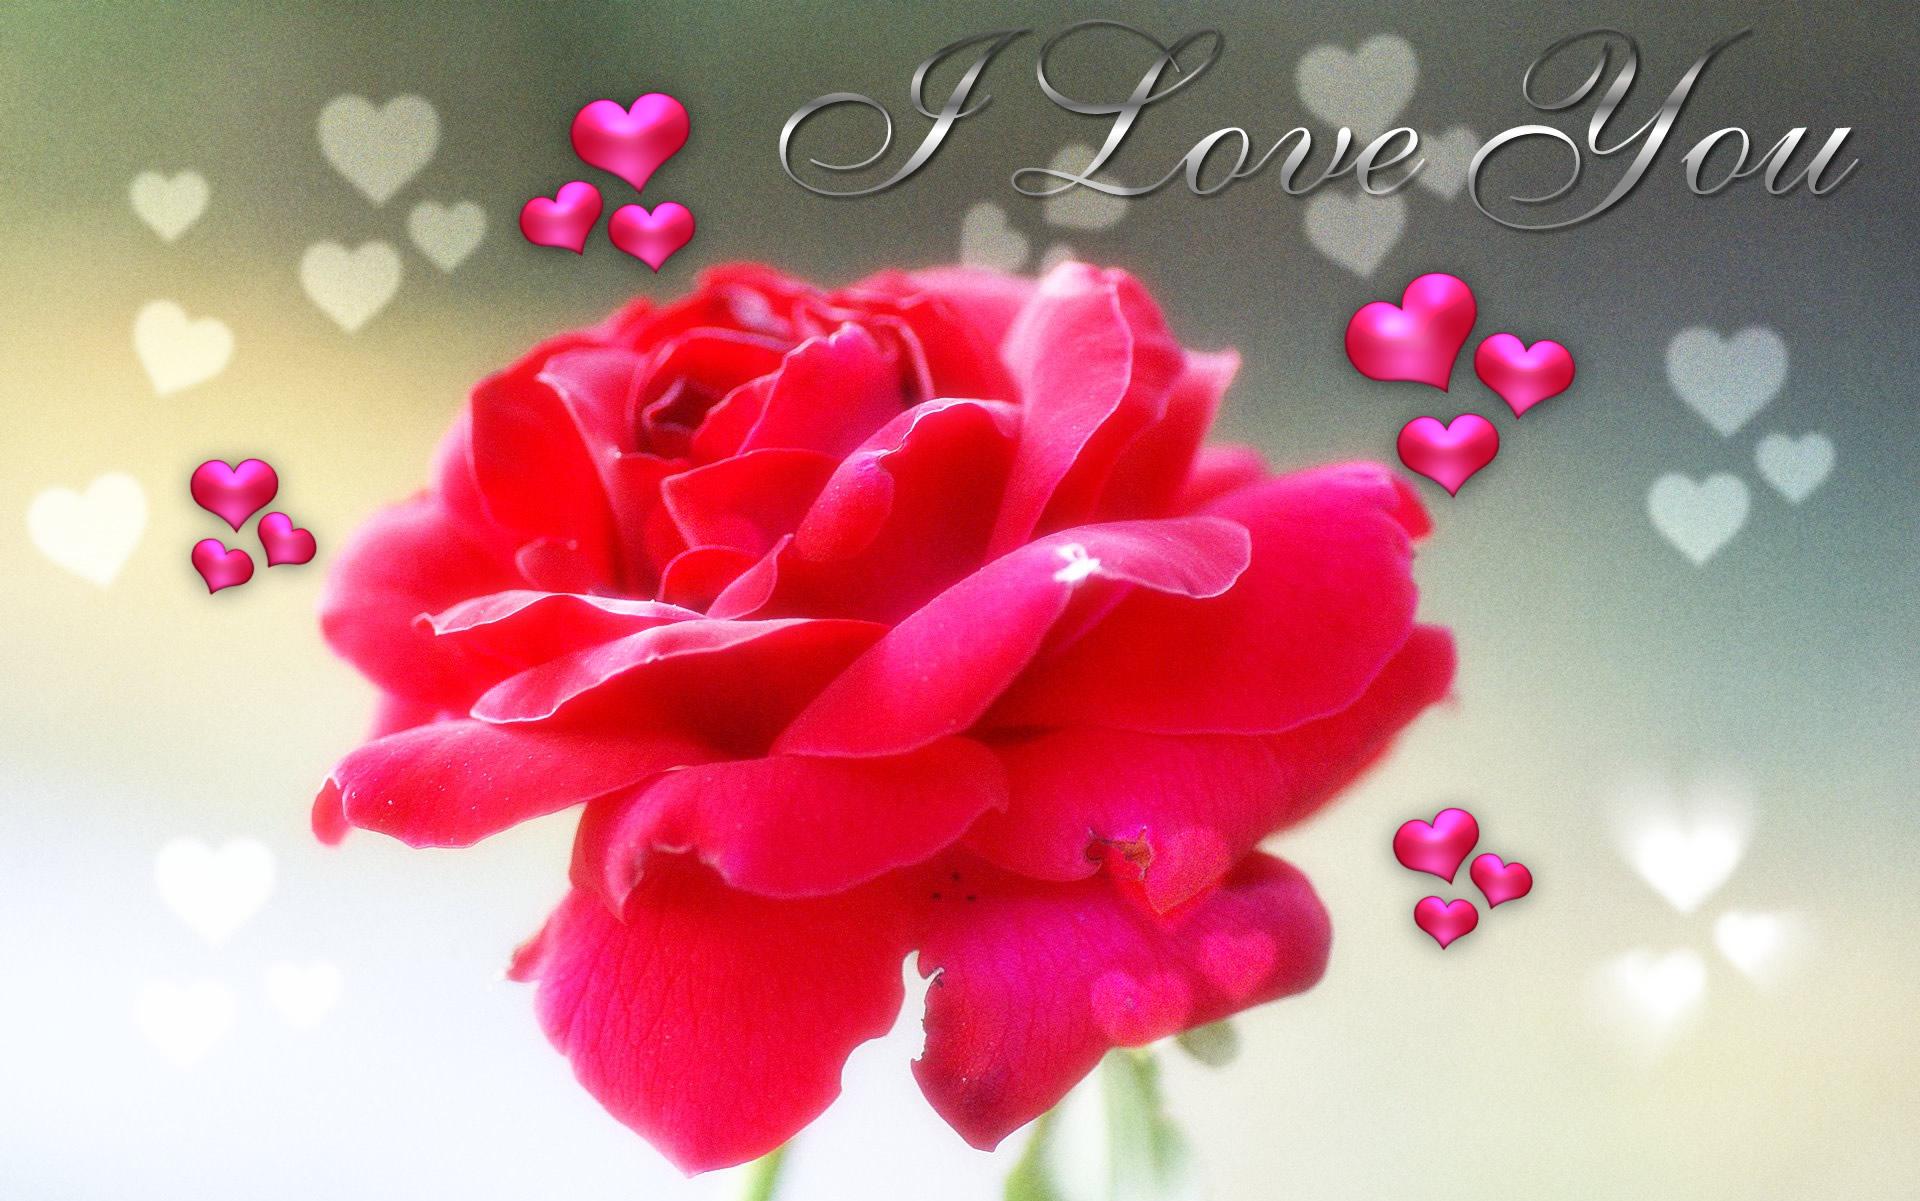 wallpaper download hd love,petal,pink,red,flower,valentine's day